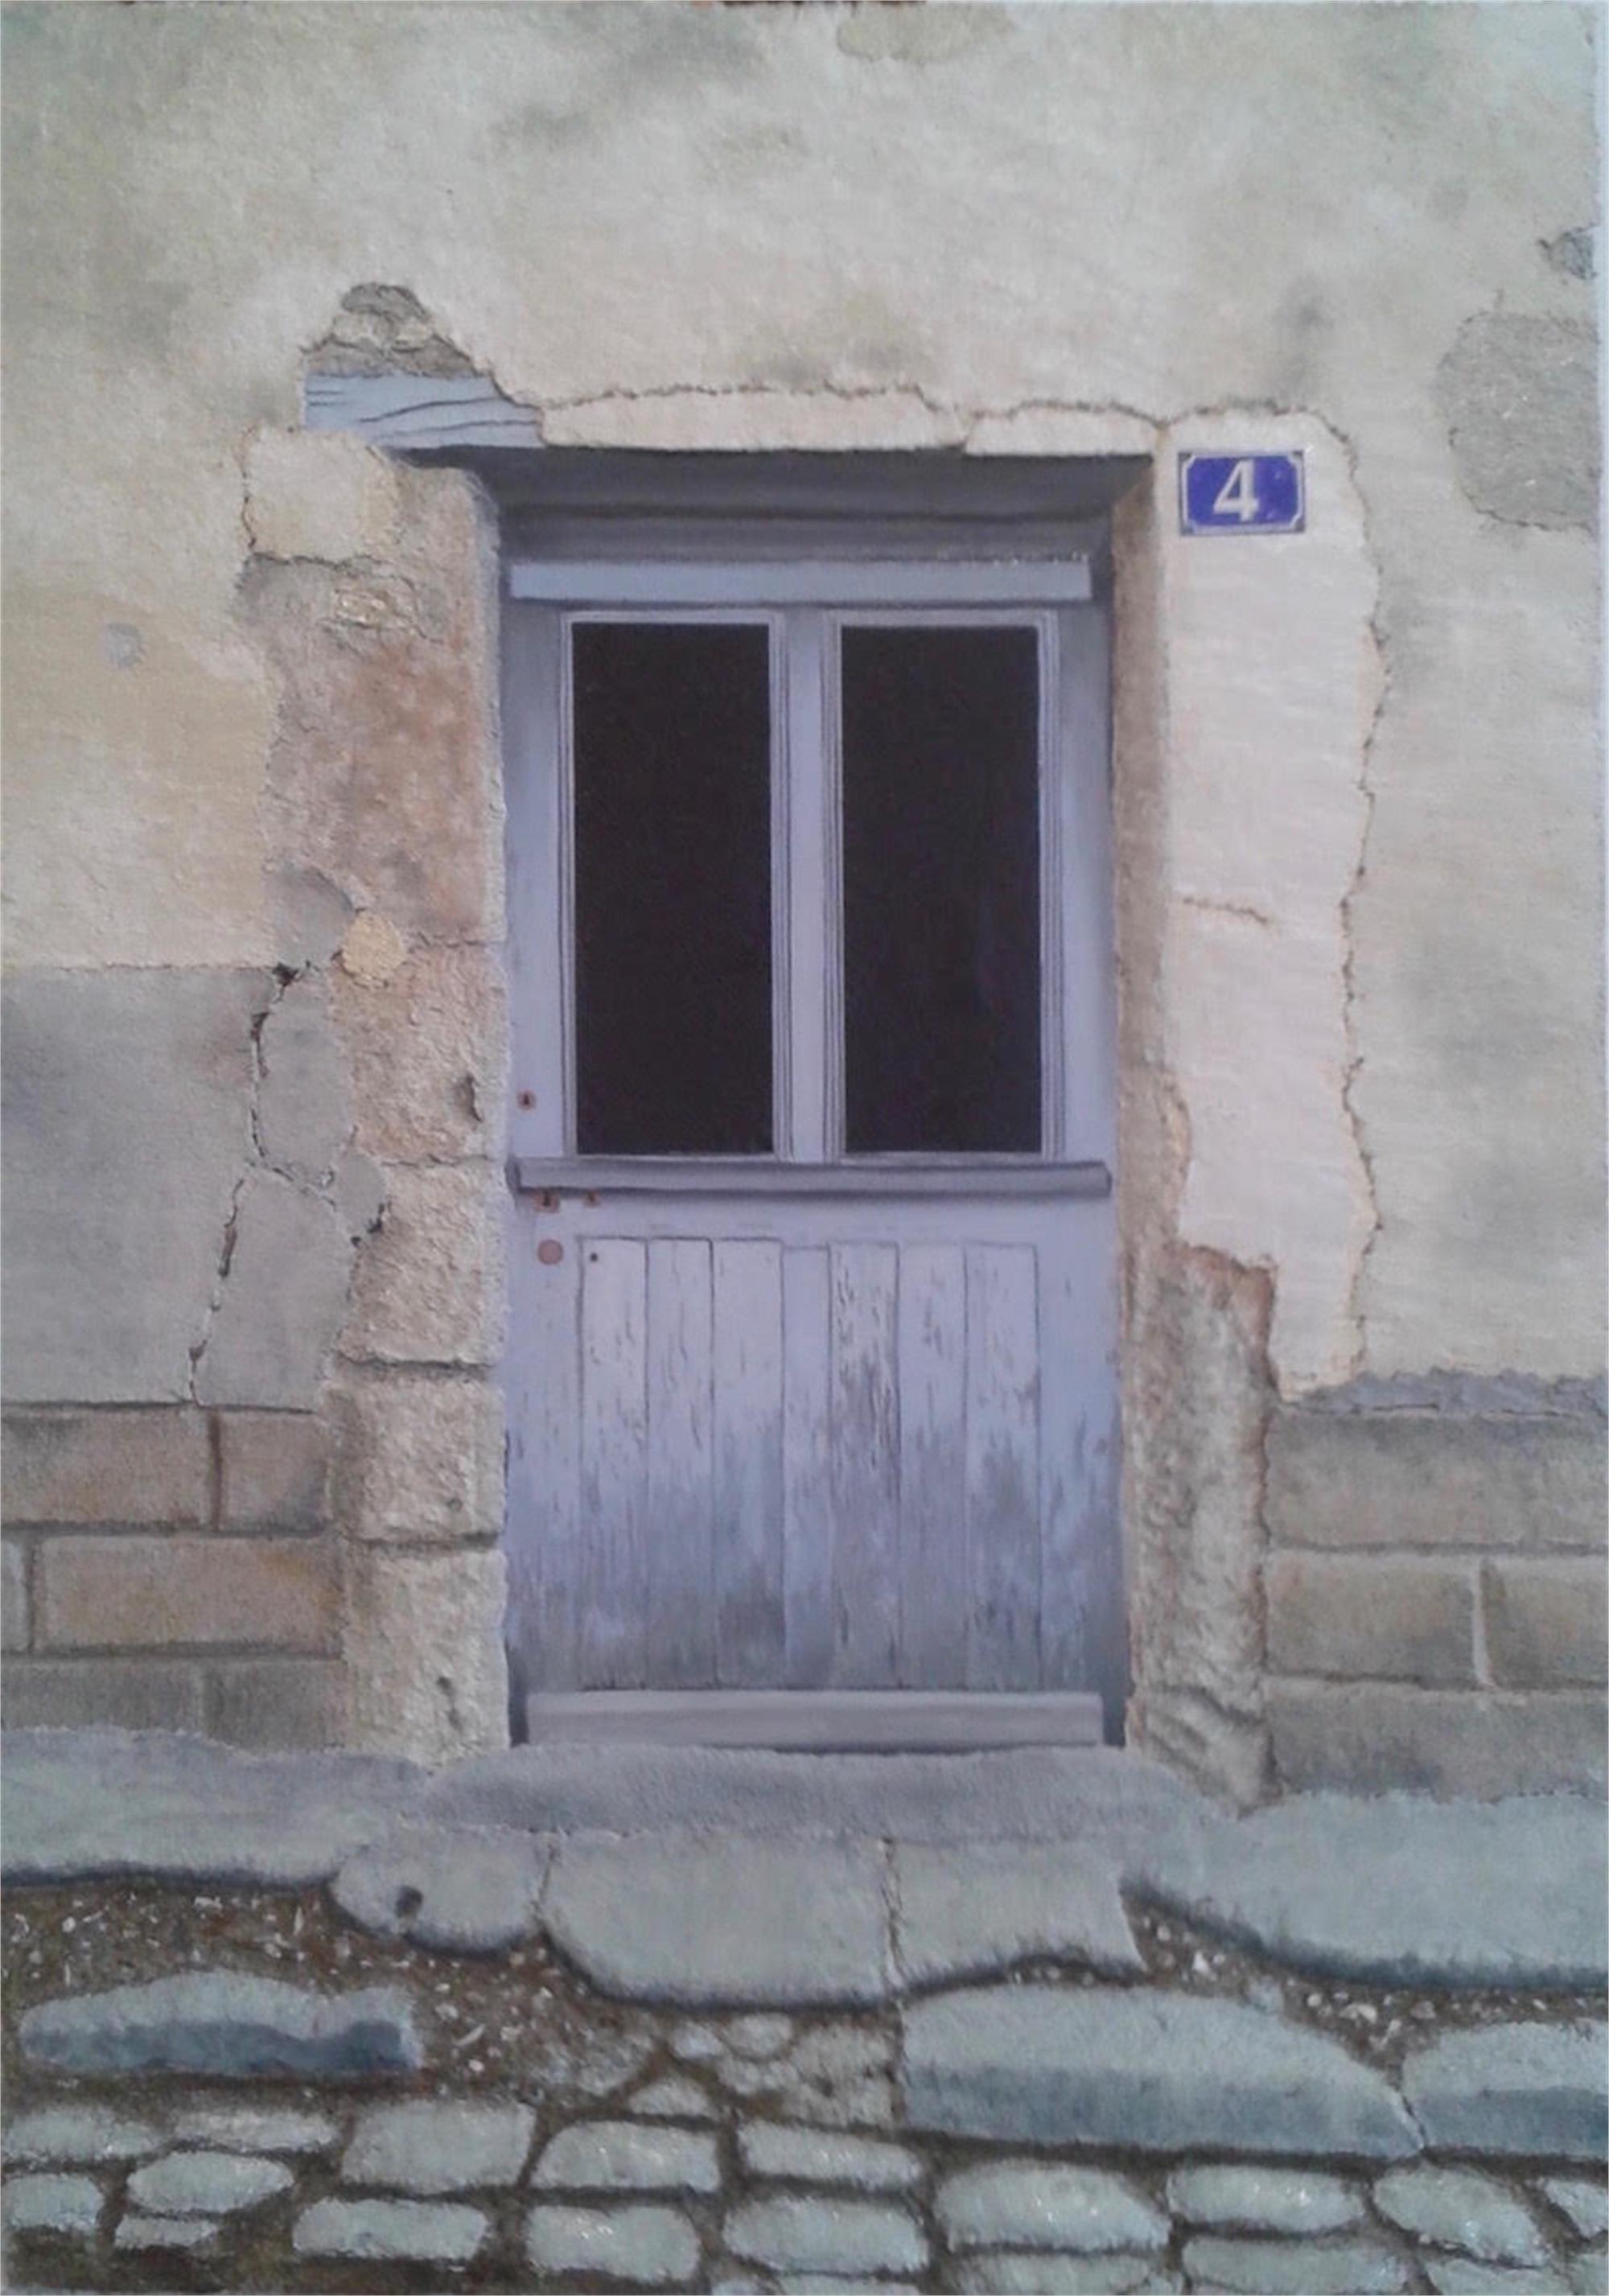 4 Rue Dessertenne by Andy Feehan